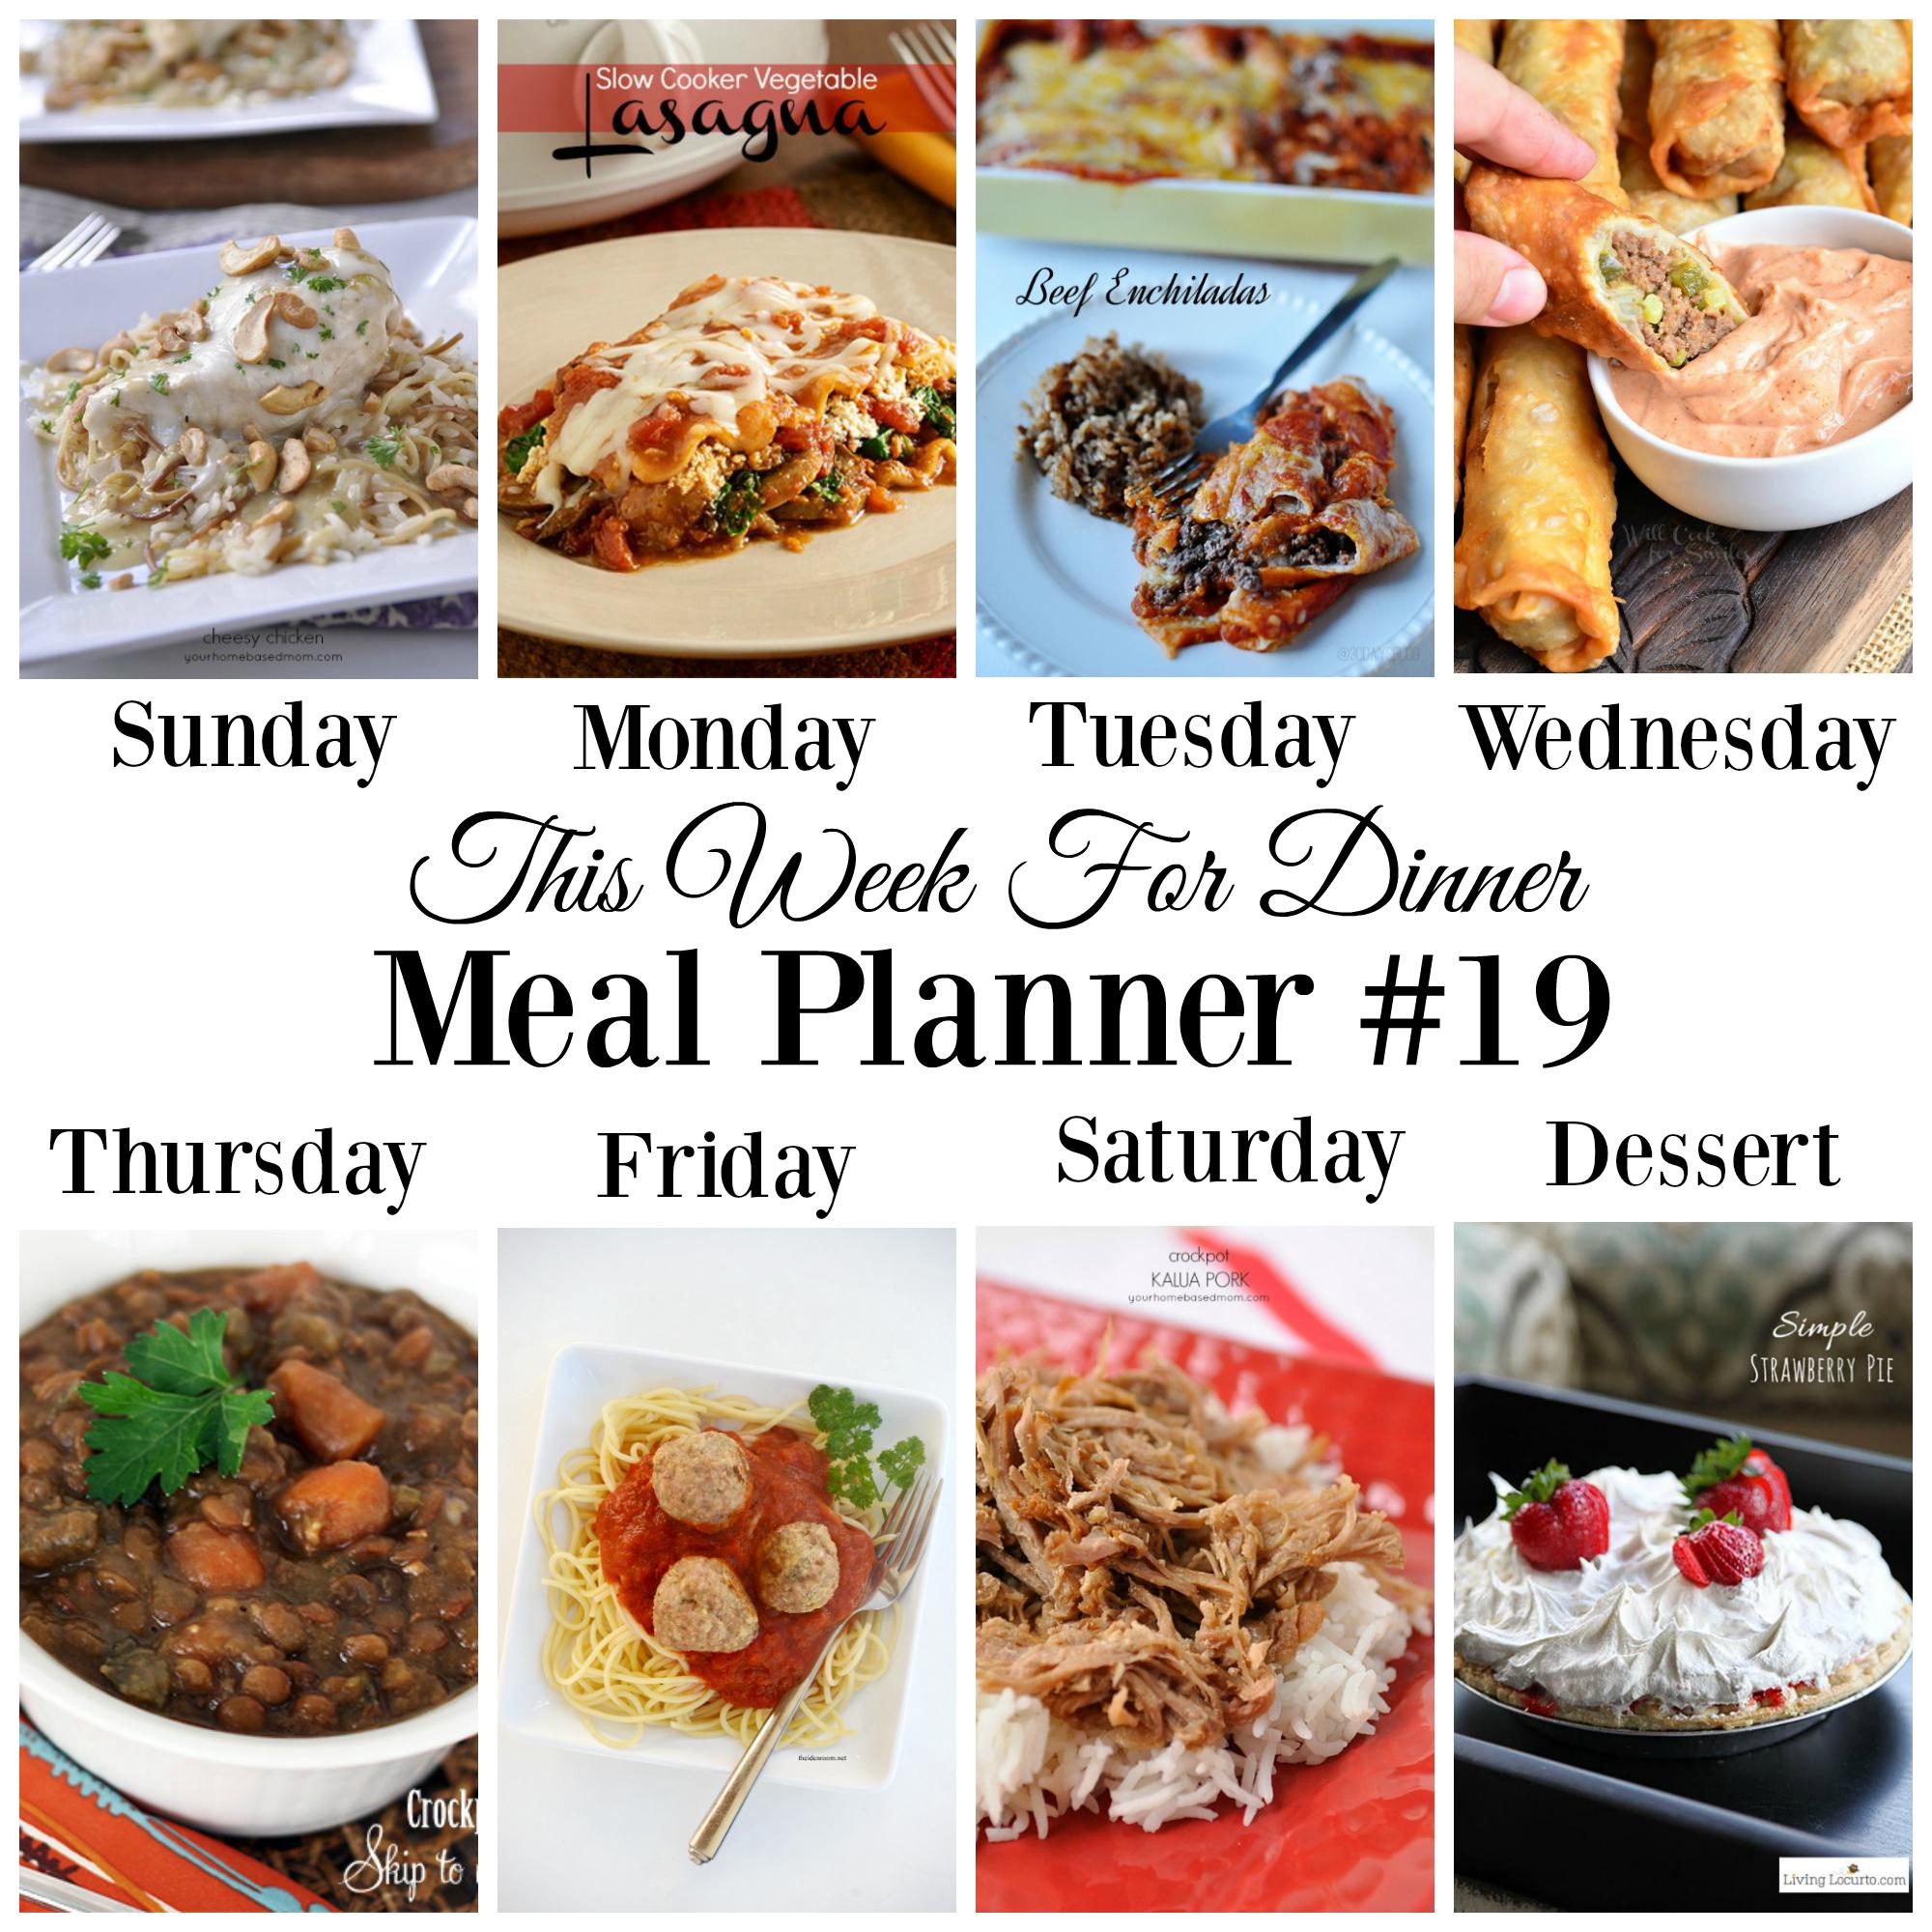 weekly meal planner #19